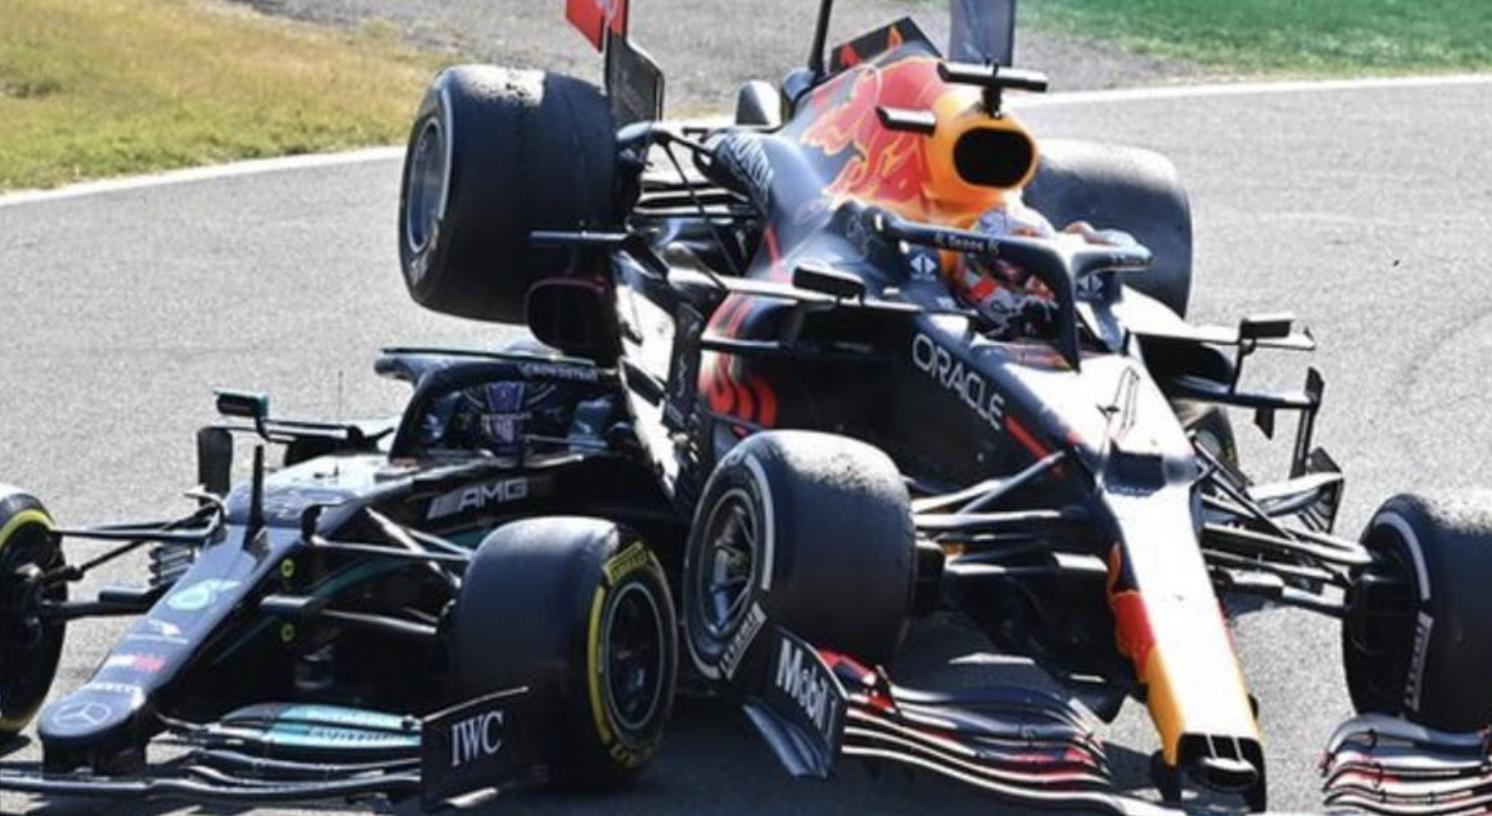 Italian Grand Prix crash